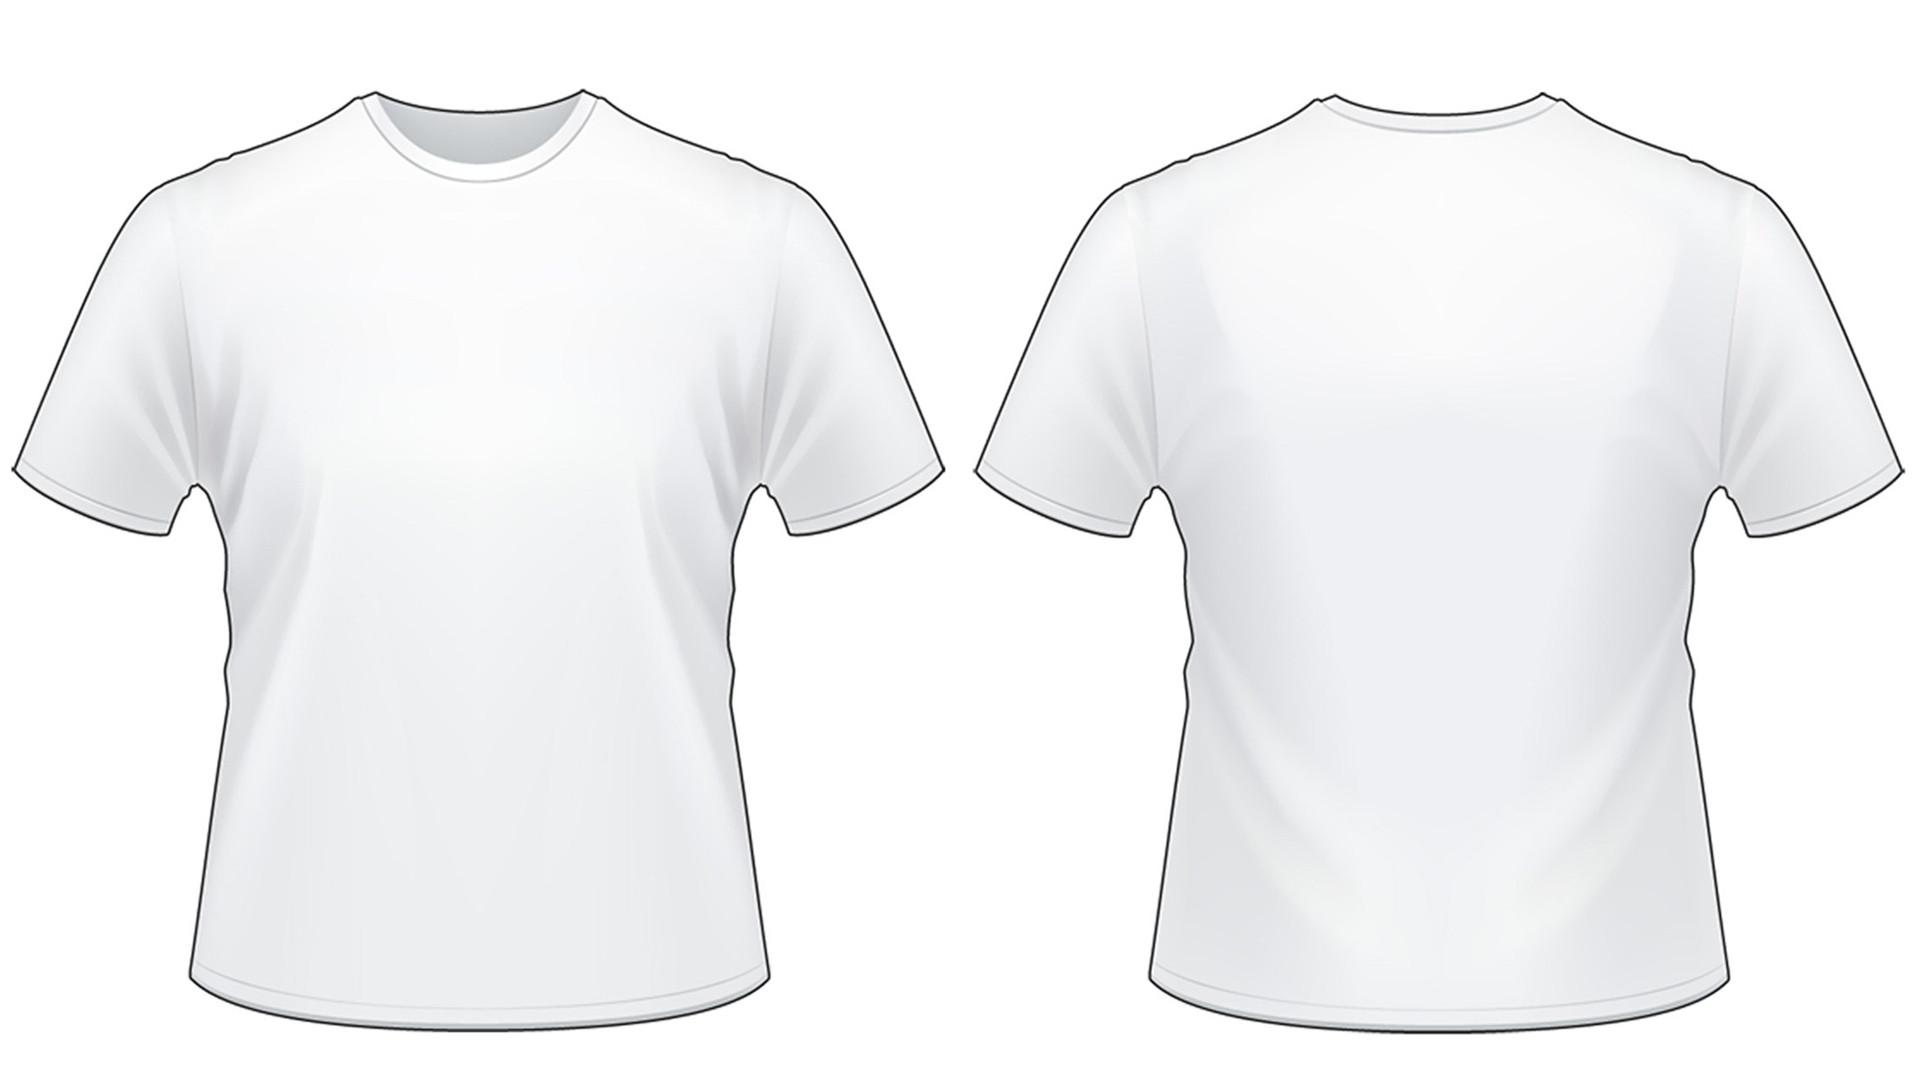 Tee Shirt Design Template Blank Tshirt Template Worksheet In Png Hd Wallpapers